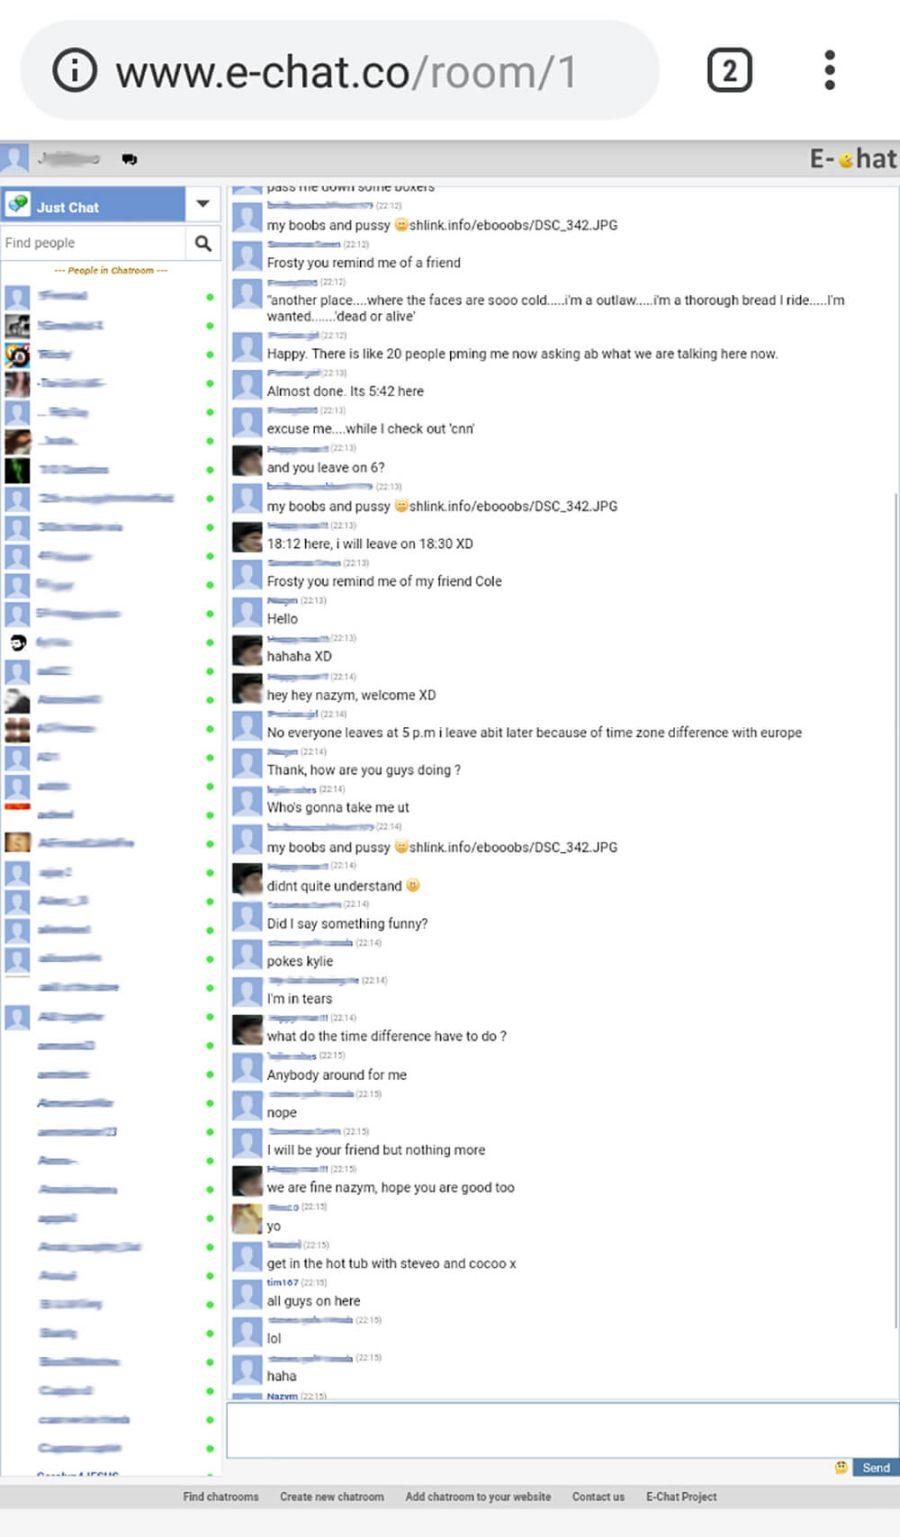 E-chat App